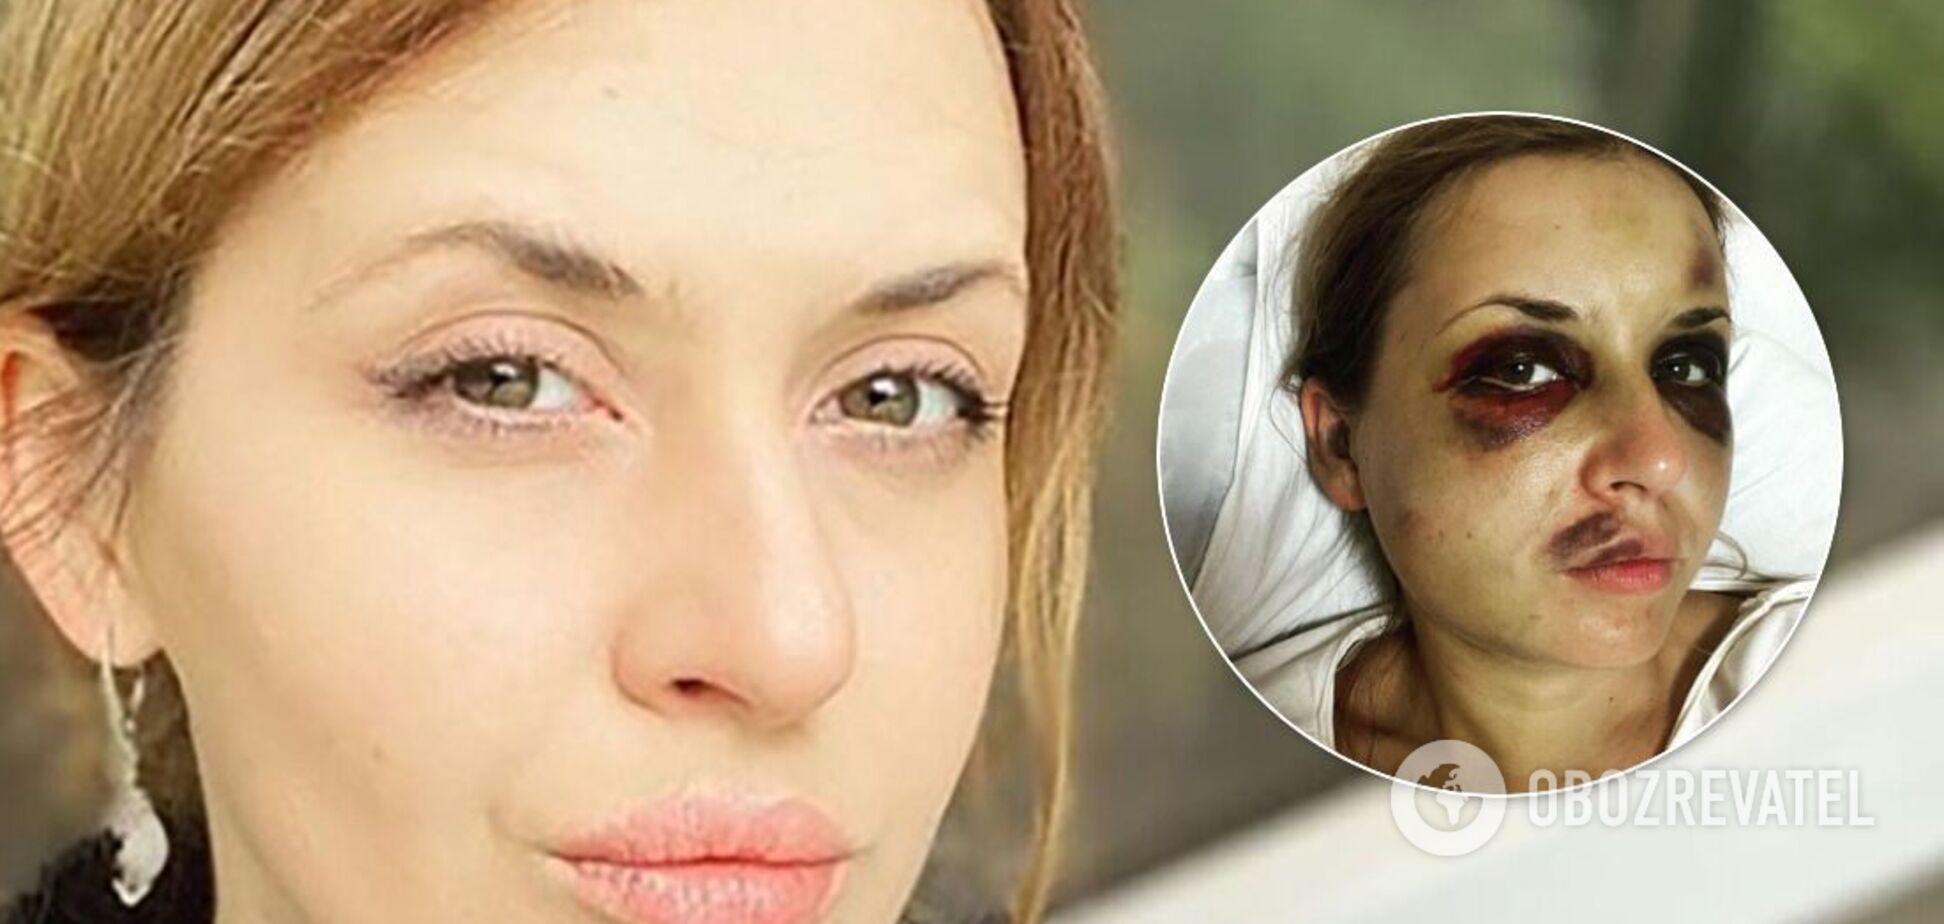 Анастасія Лугова до та після нападу